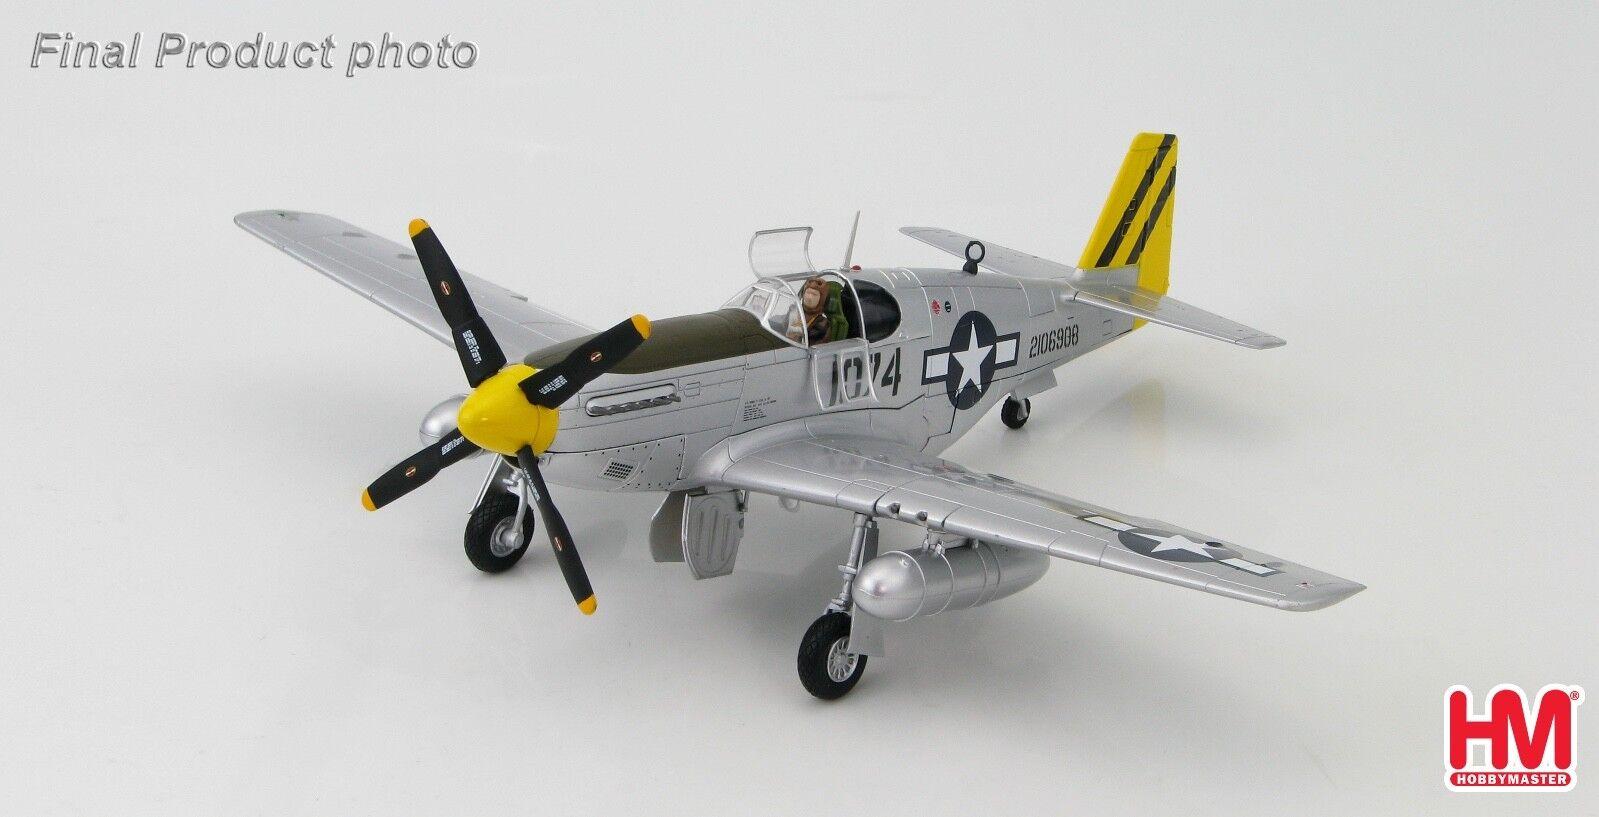 Hobby Master HA8506 1 48 P-51B  Mustang Lt. Leonard R. Reeves Pungchacheng 1945  en solde 70% de réduction